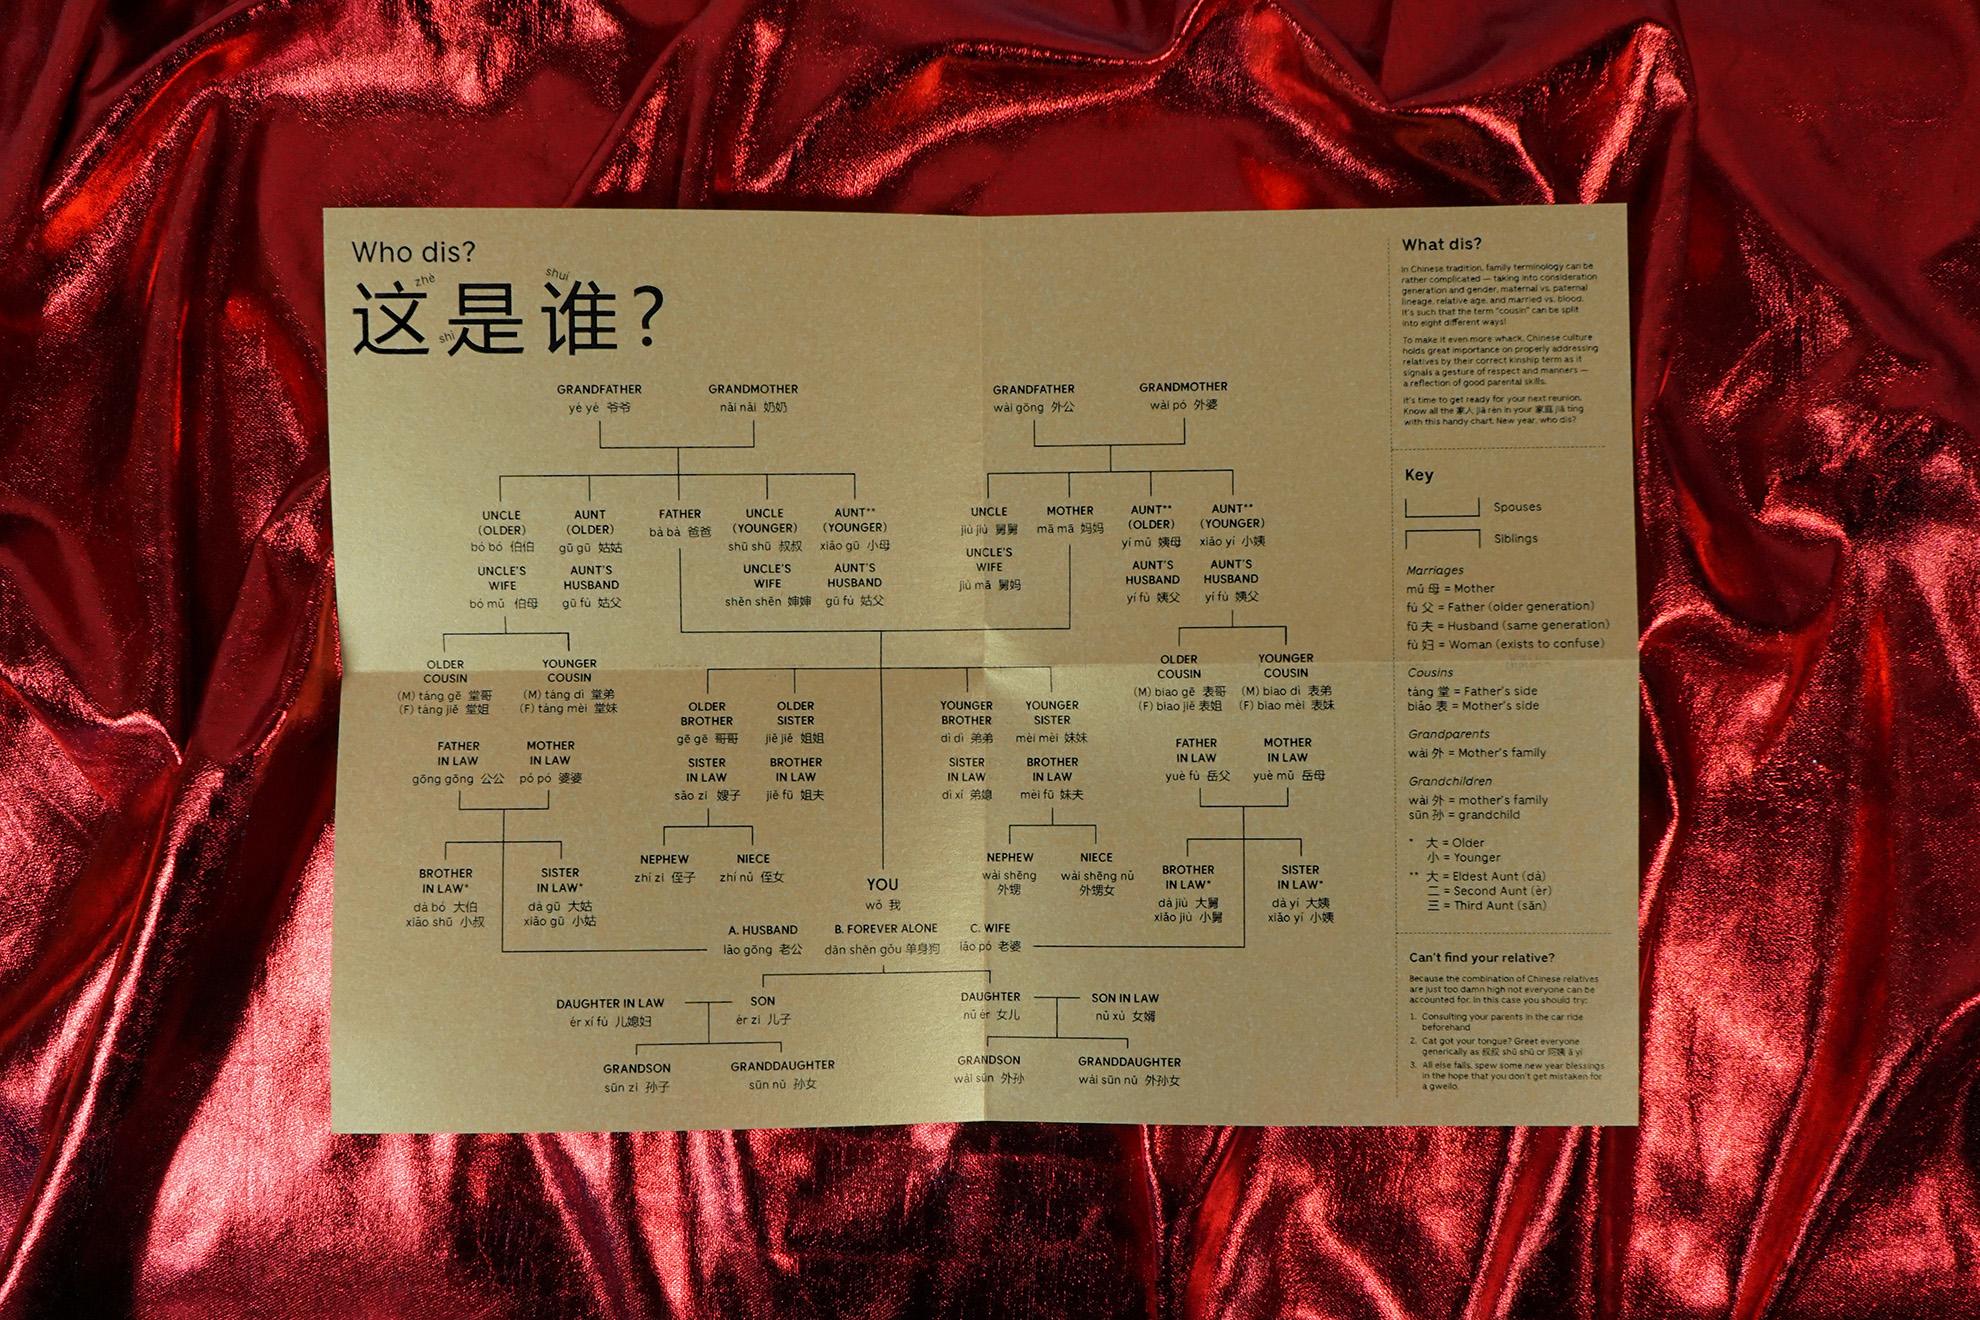 JoyLi_CNY_Red_6_Web.jpg